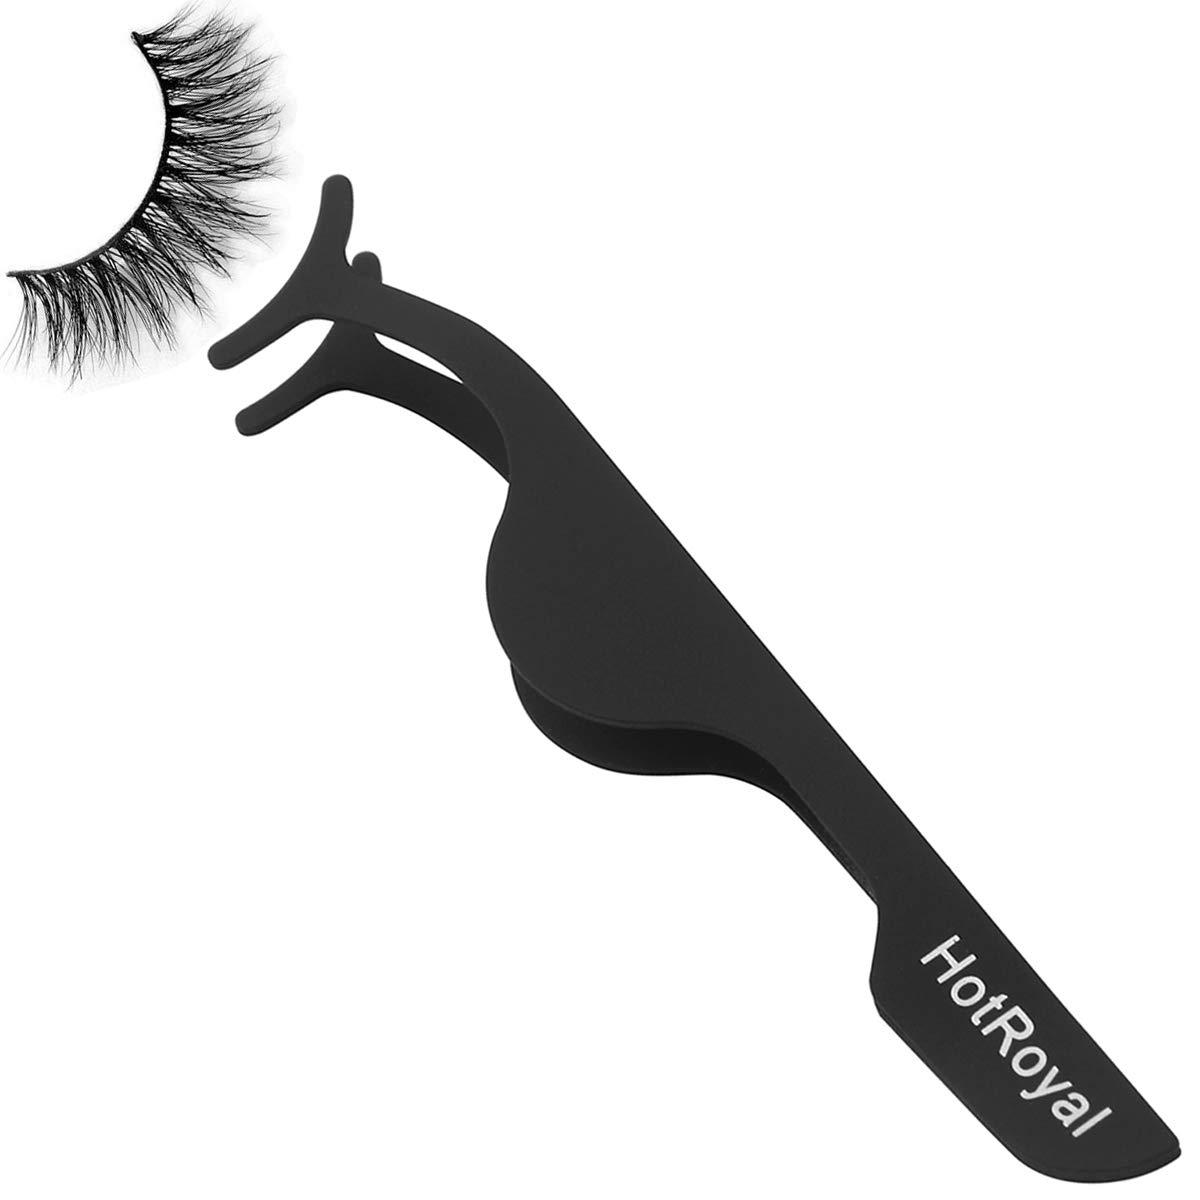 Black Stainless Steel False Eyelash Curlers Extension Applicator Remover Clip Eyebrow Eye Lashes Tweezers Nipper Makeup Beauty Tool HorRoyal